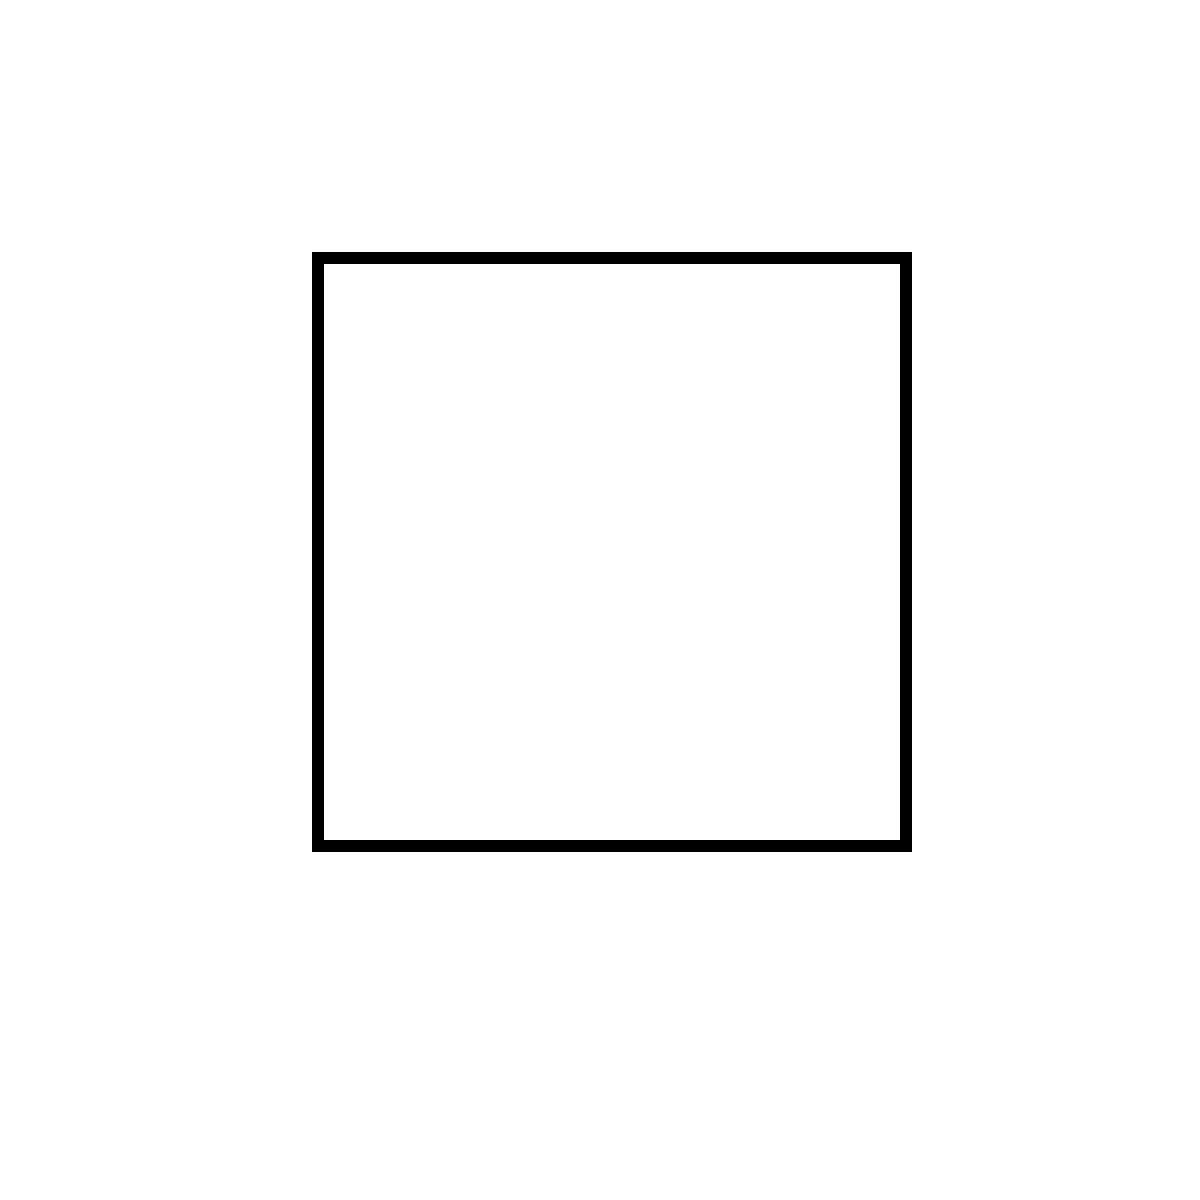 Рисунок квадрата карандашом